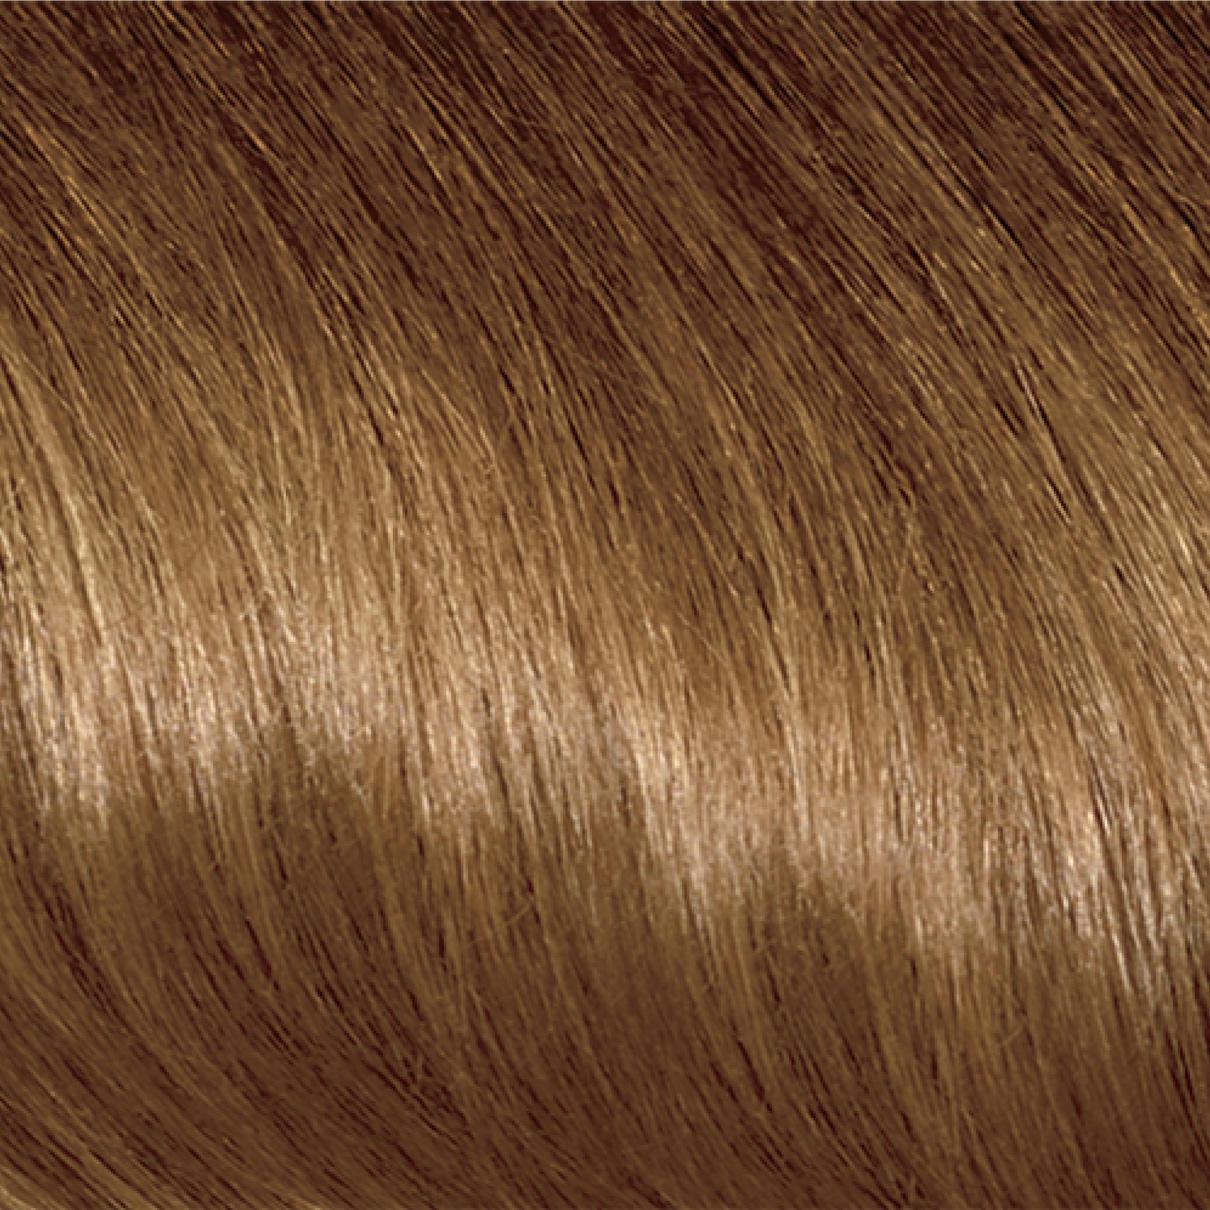 6 5g Lightest Golden Brown